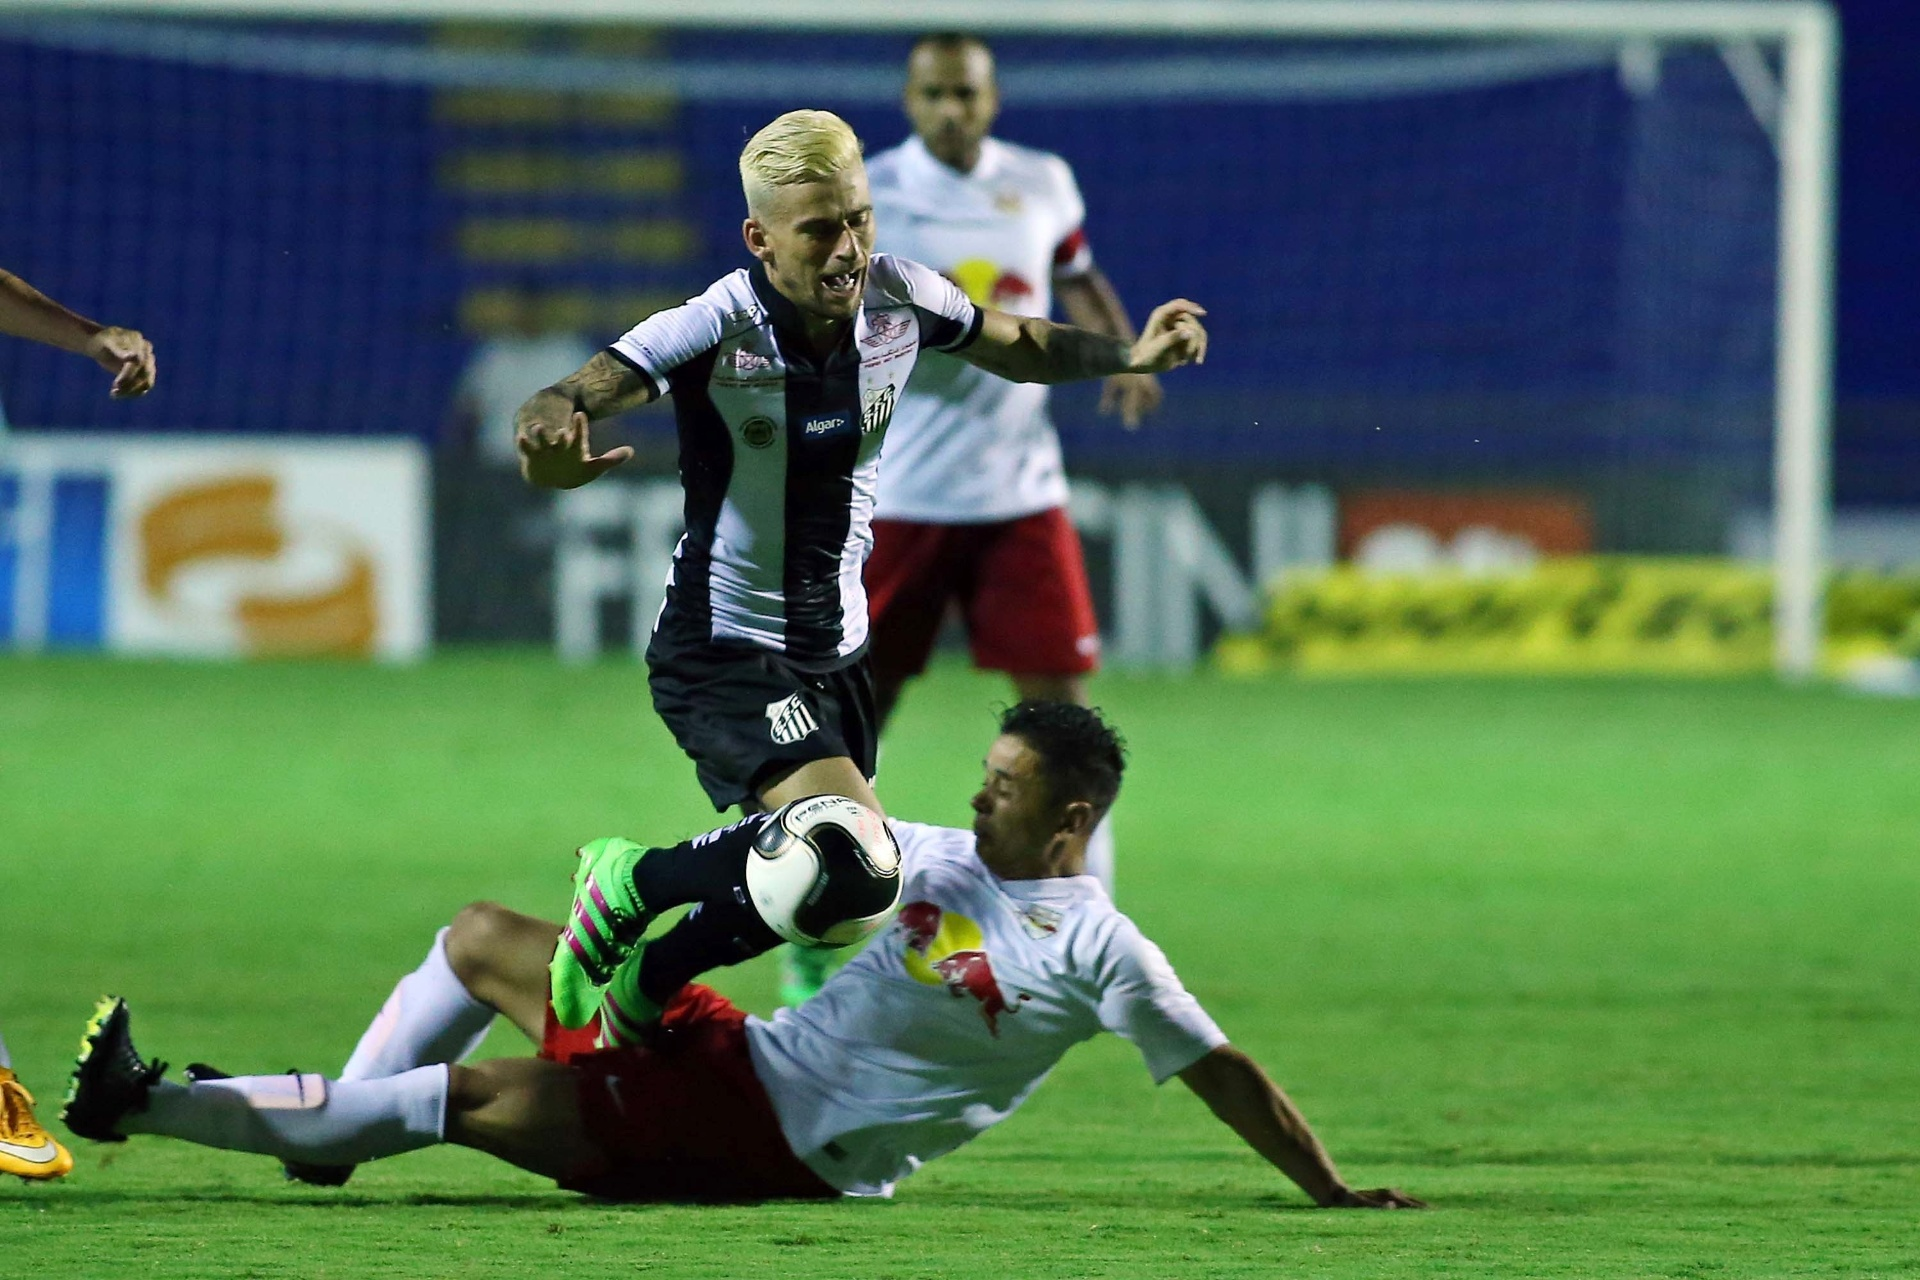 Campeonato Paulista 2016 - UOL Esporte 74d3ac2b318fa